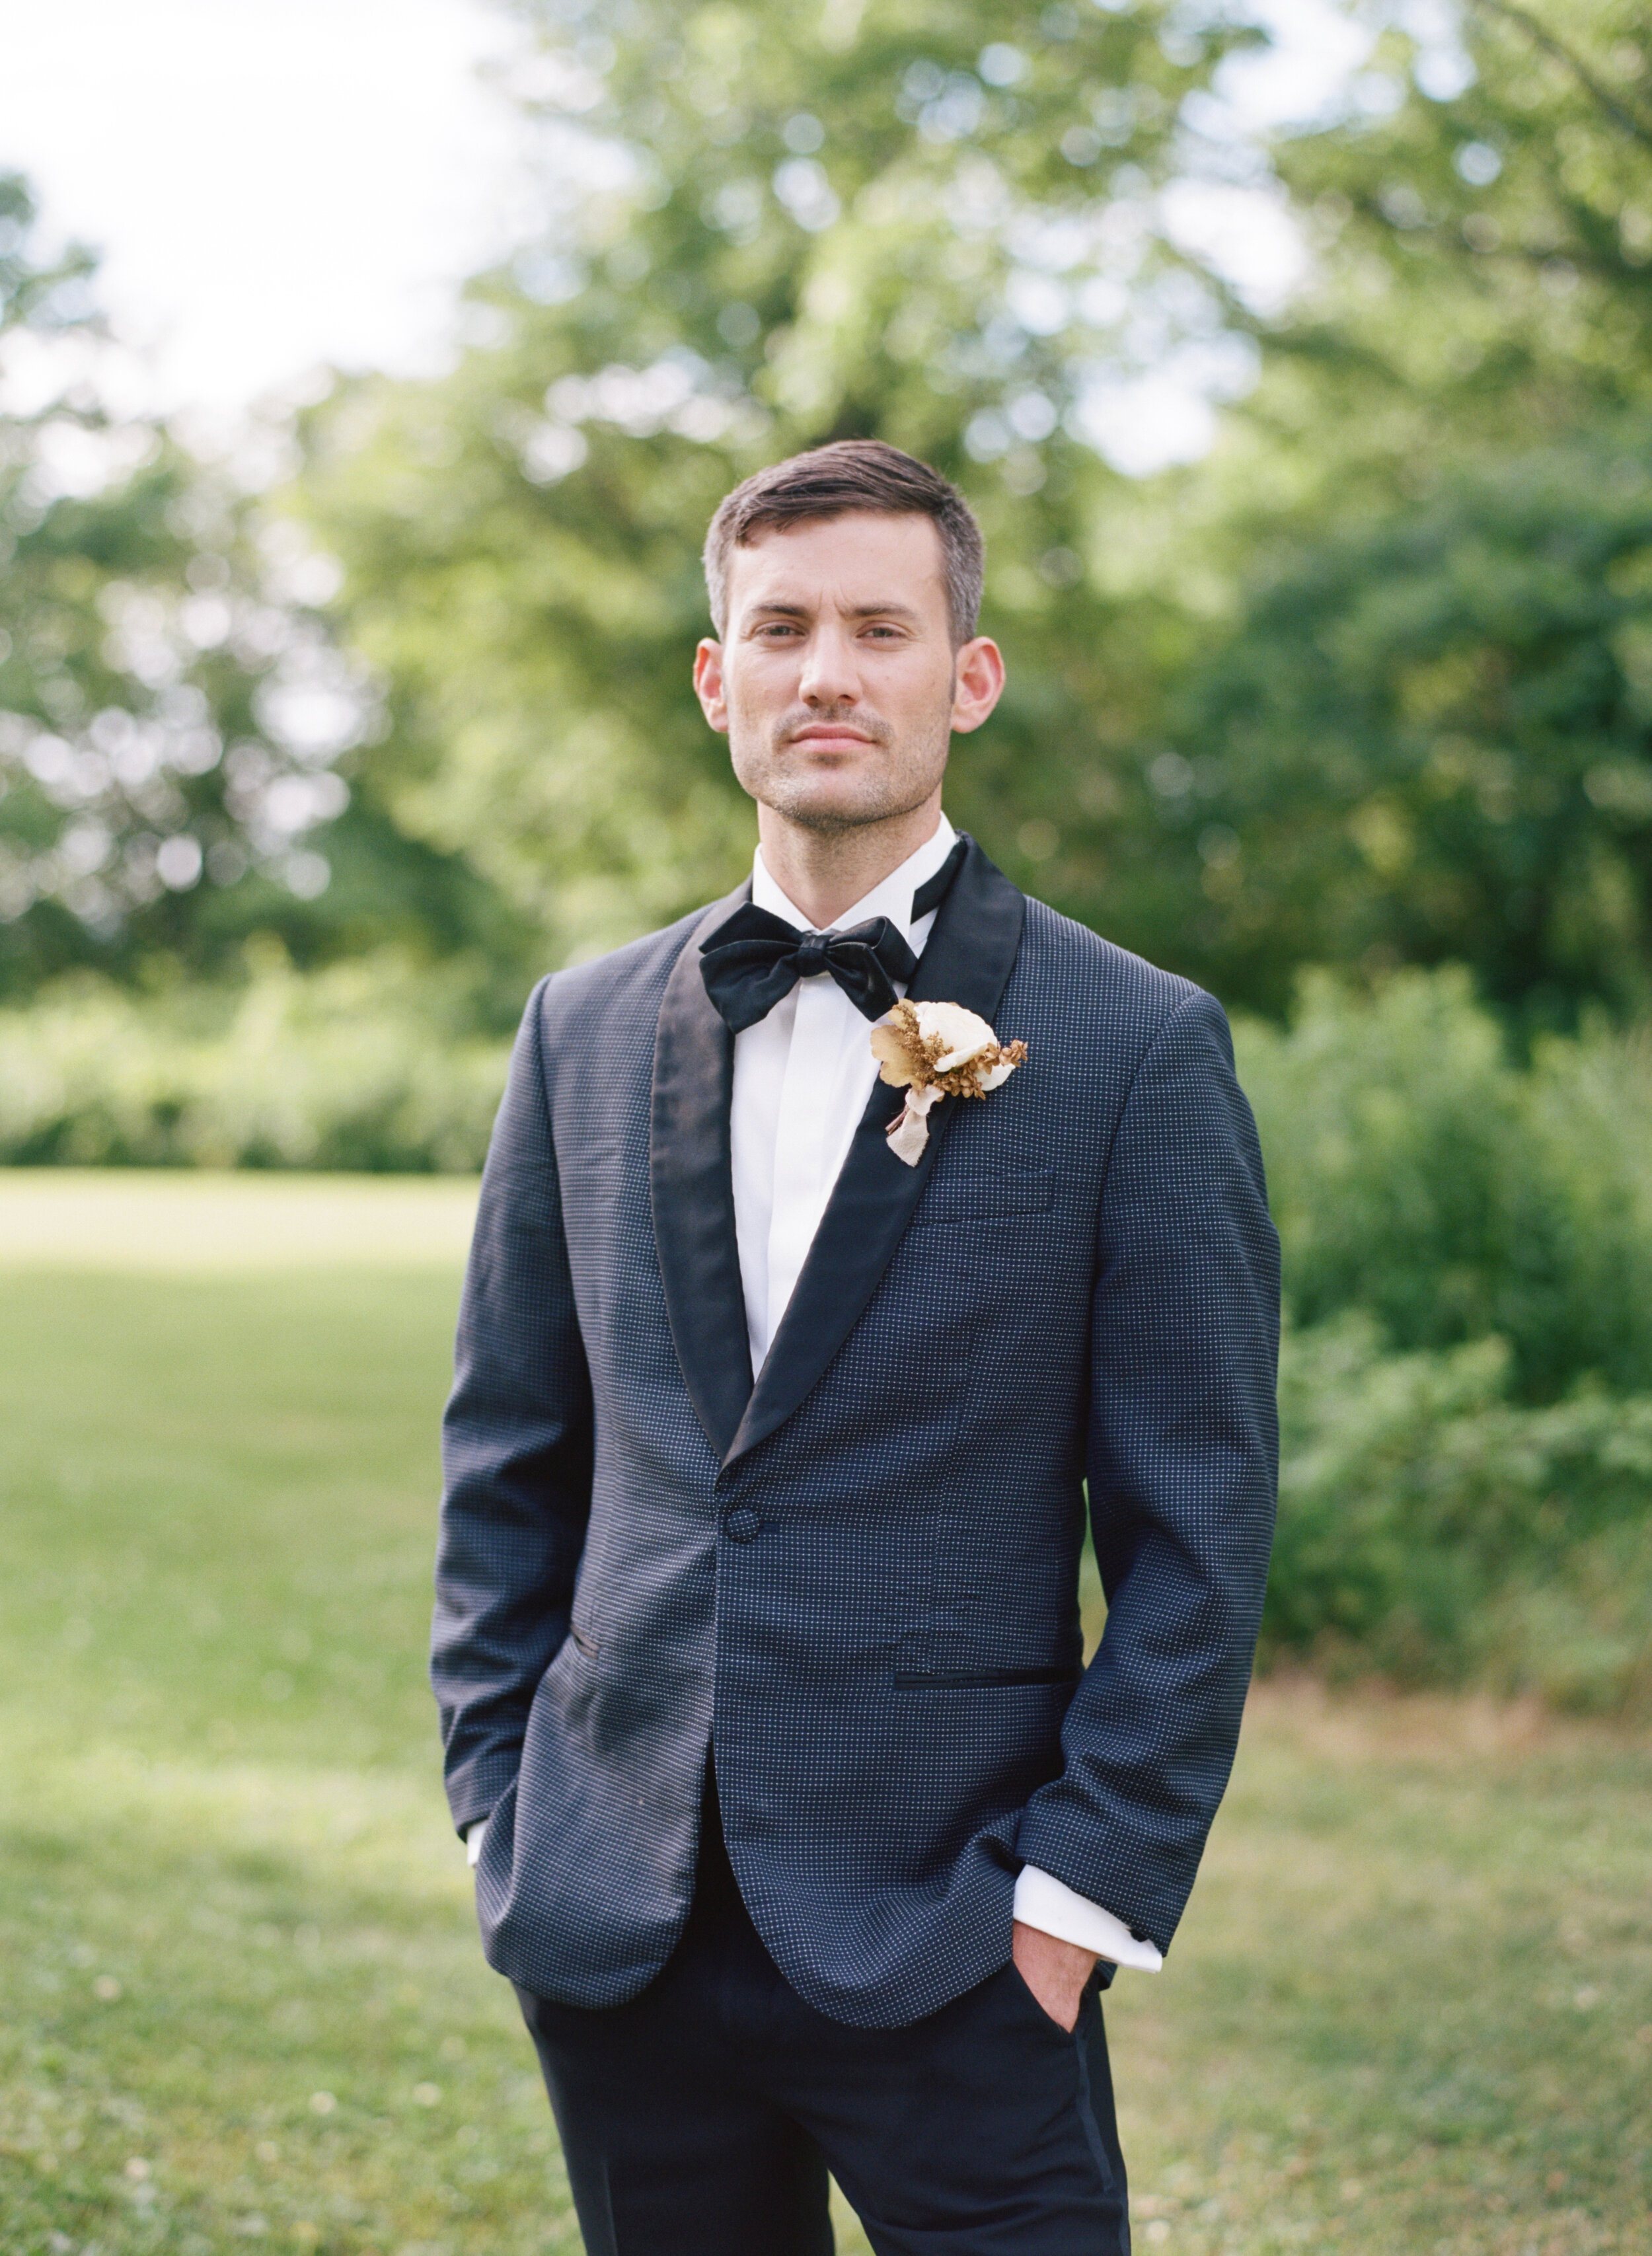 alexandra-meseke-understated-soft-luxury-wedding-upstate-ny_0083.jpg